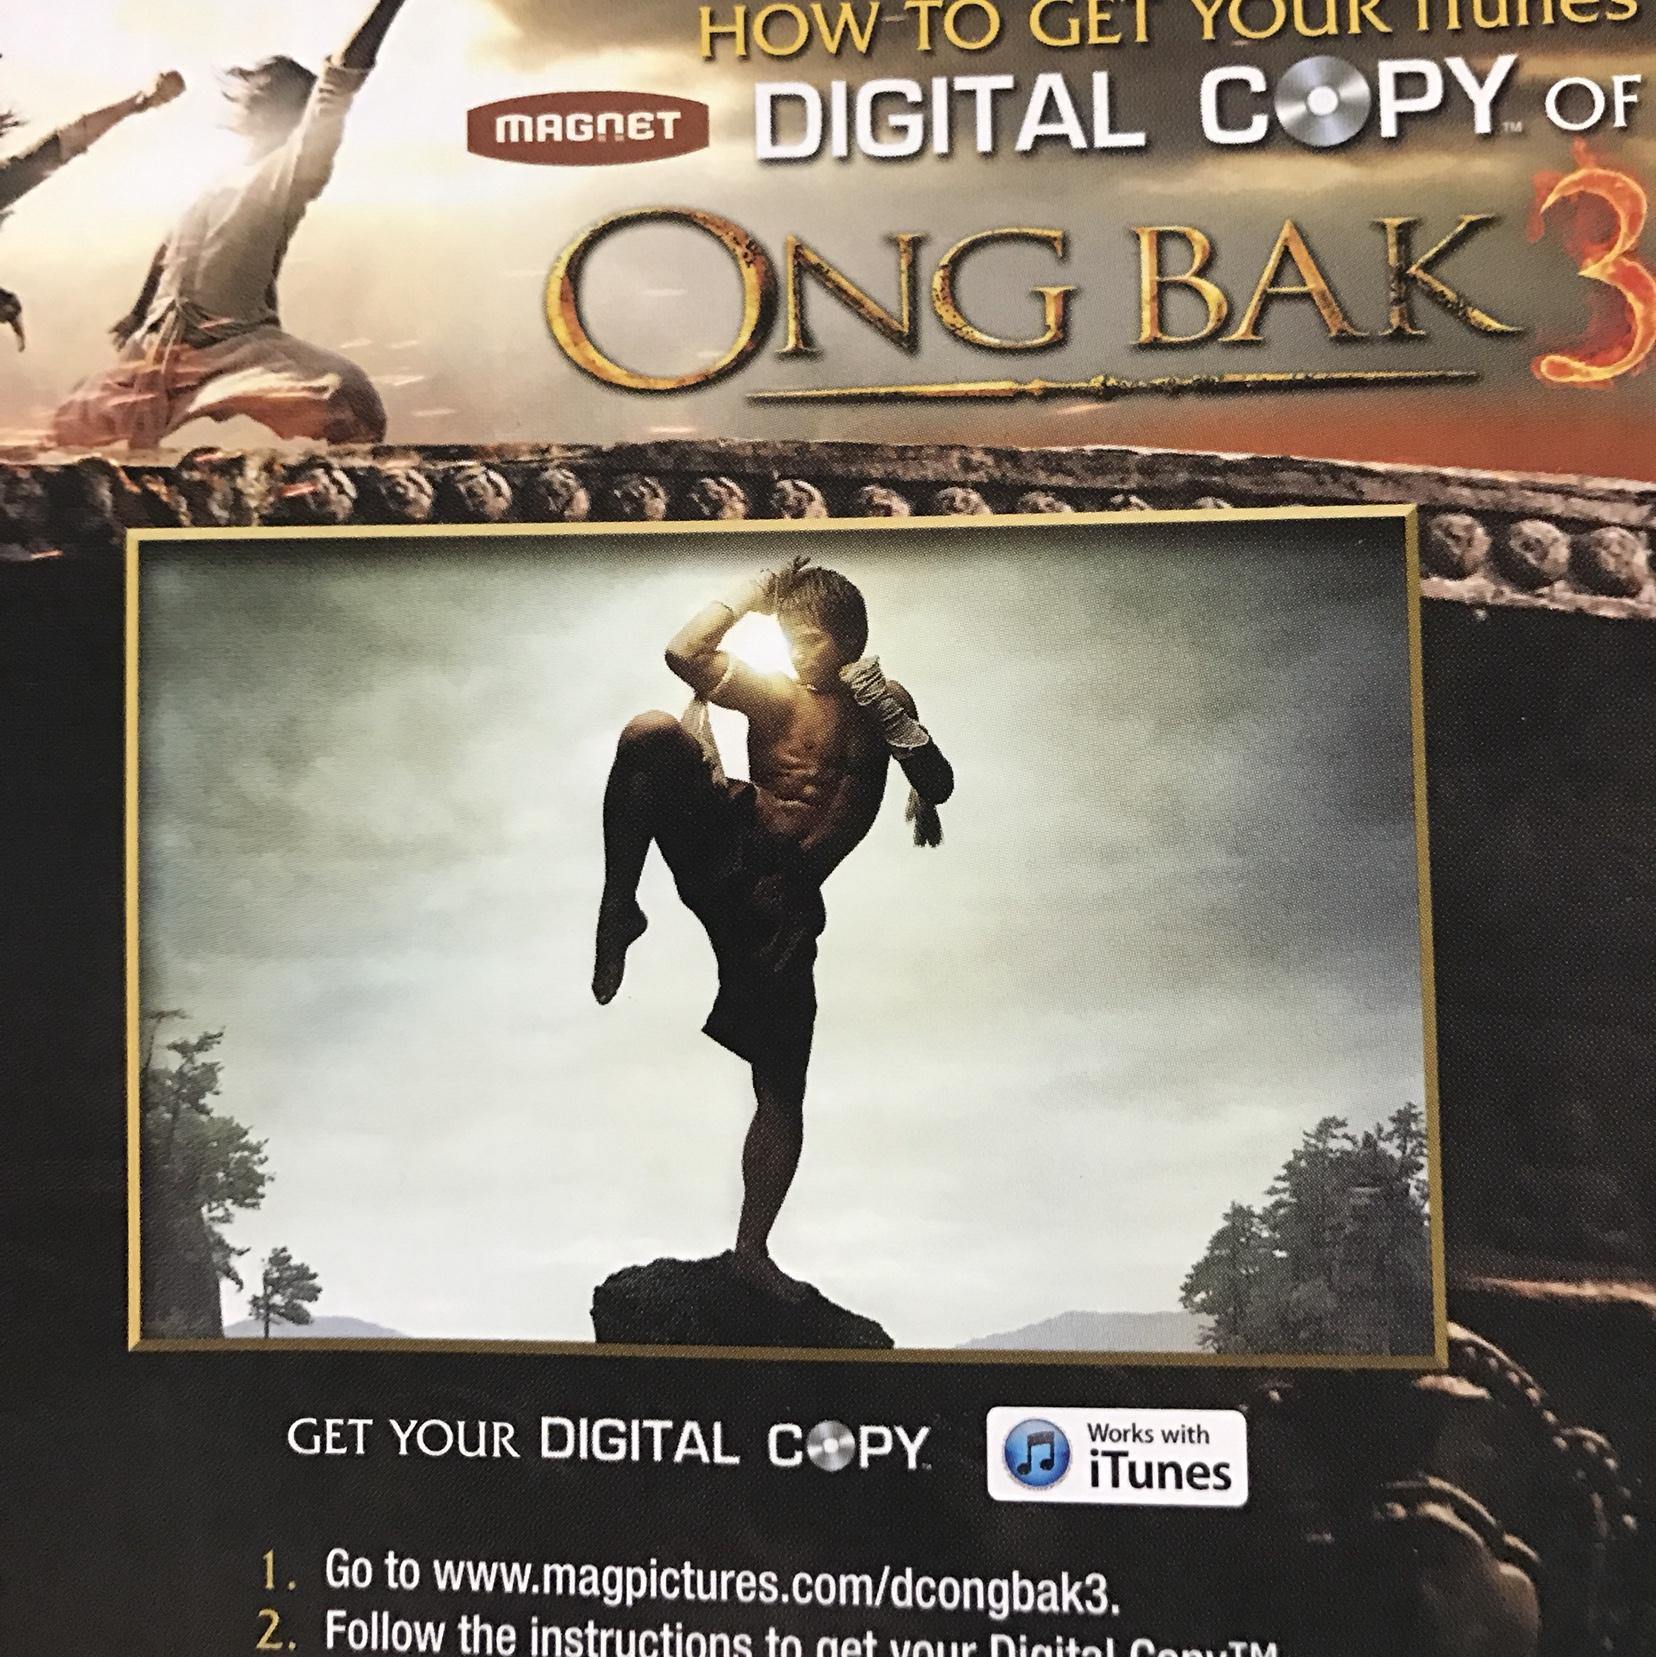 Ong Bak 3 HD digital download iTunes us only - Digital Movies